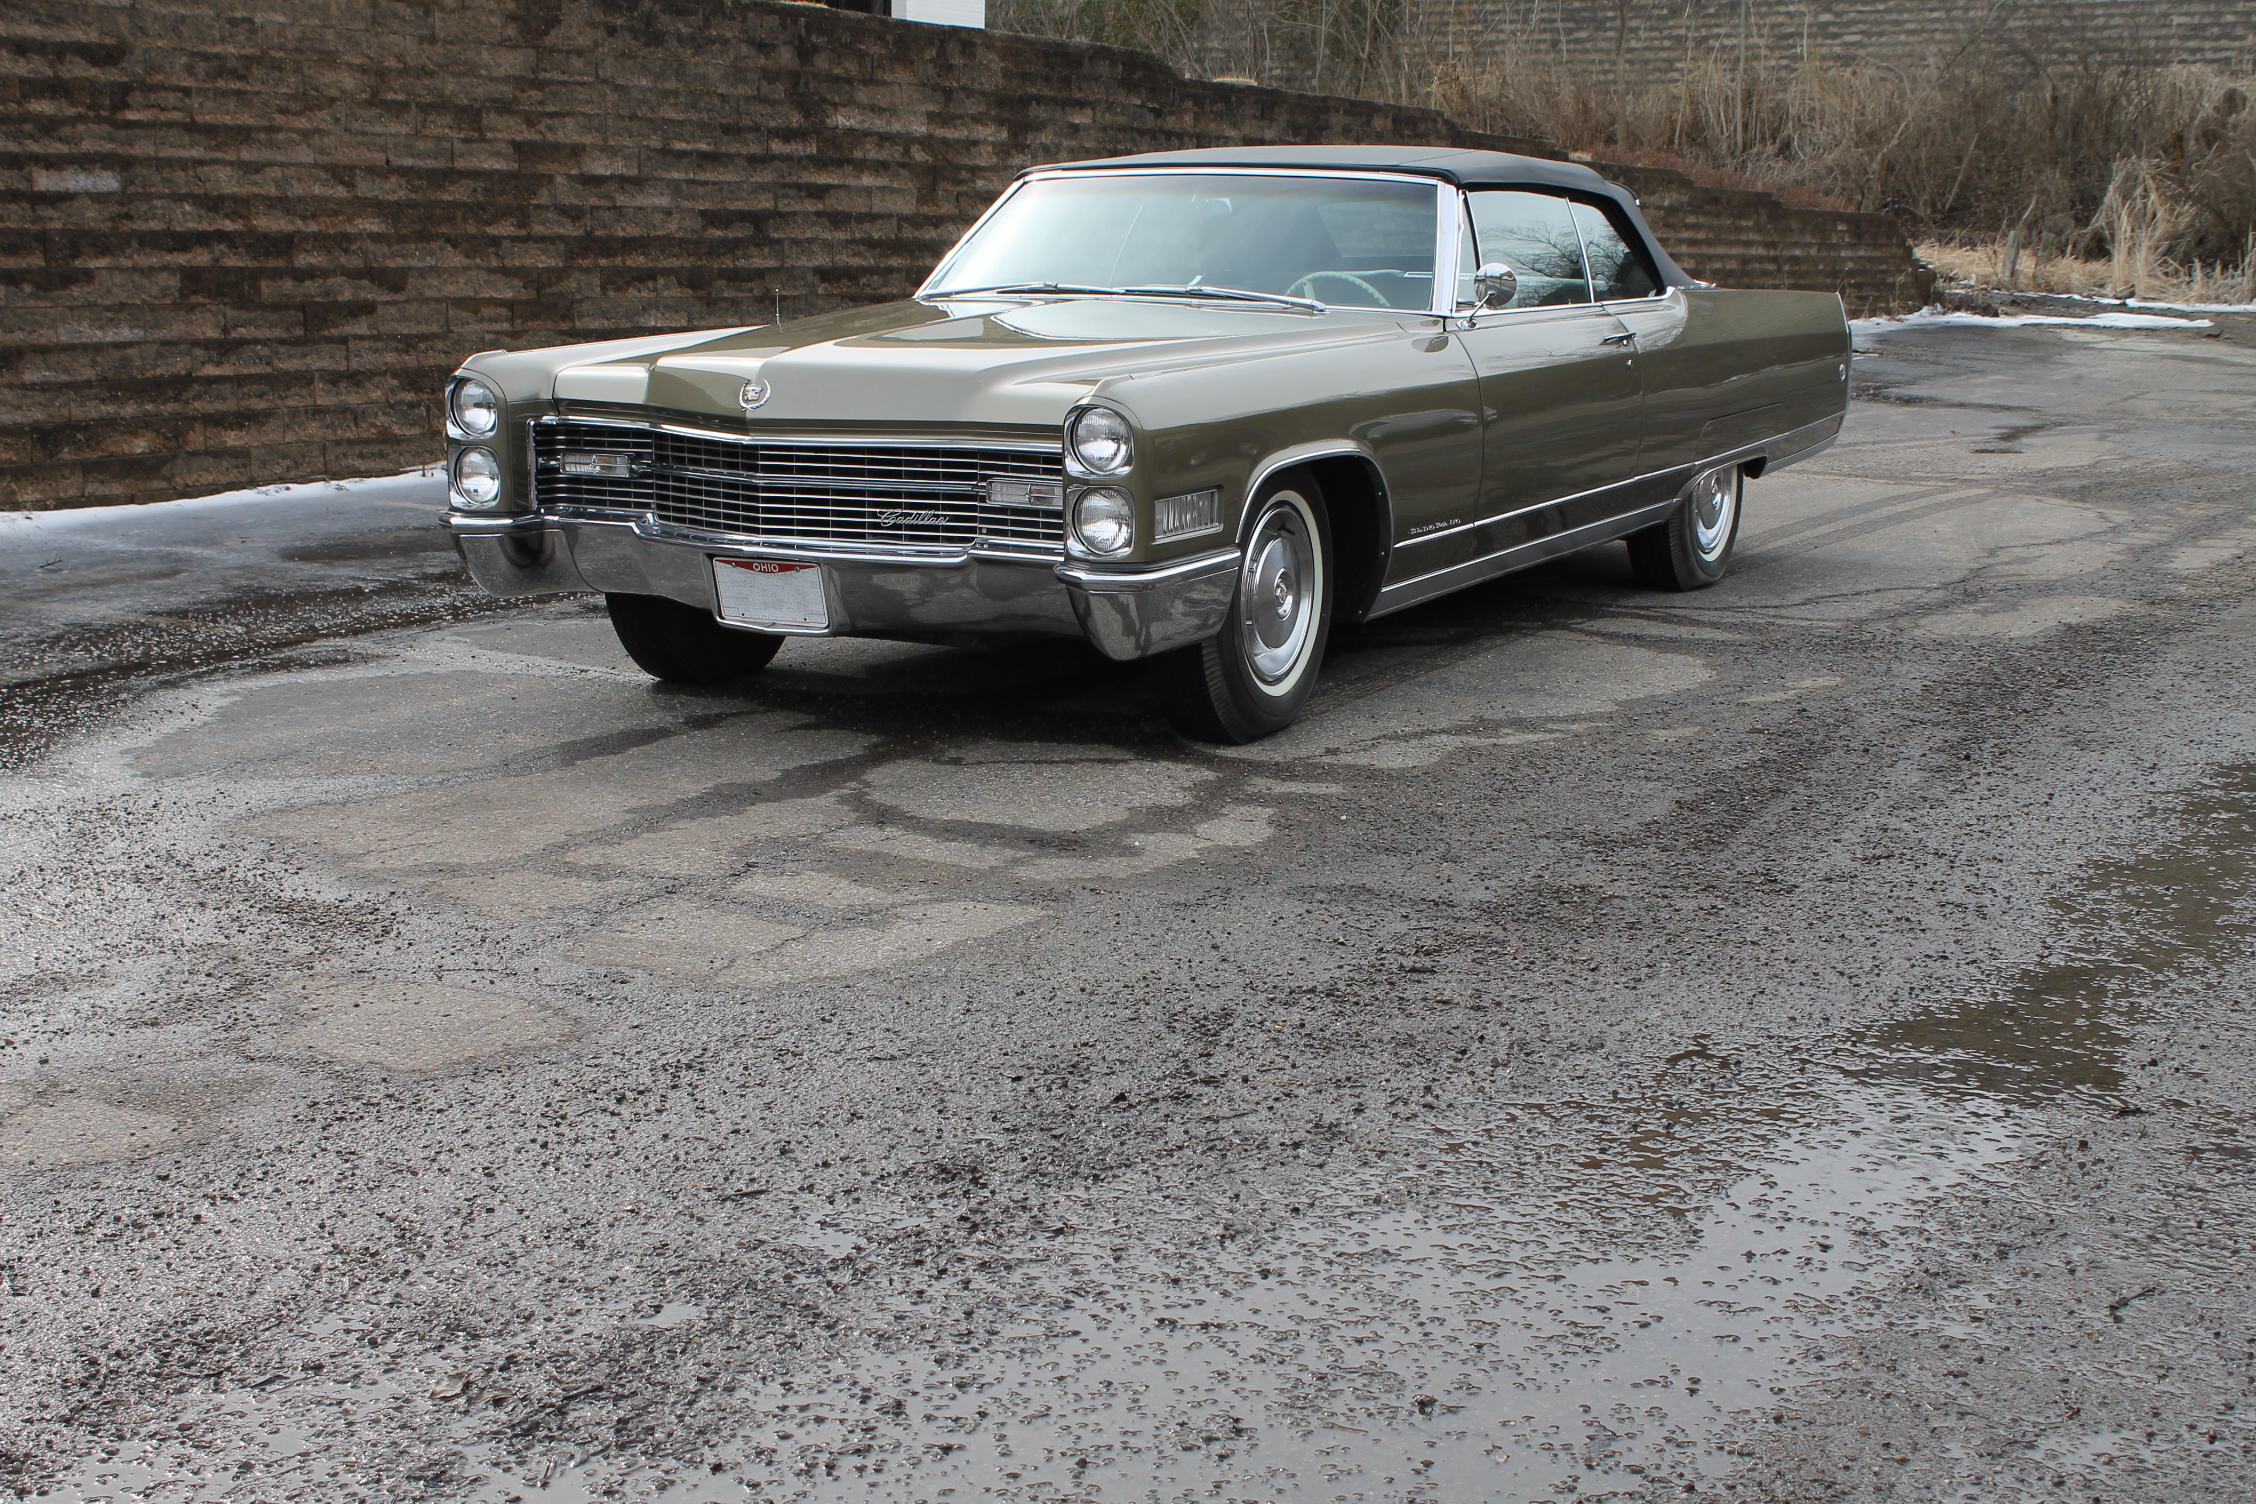 1966 Cadillac